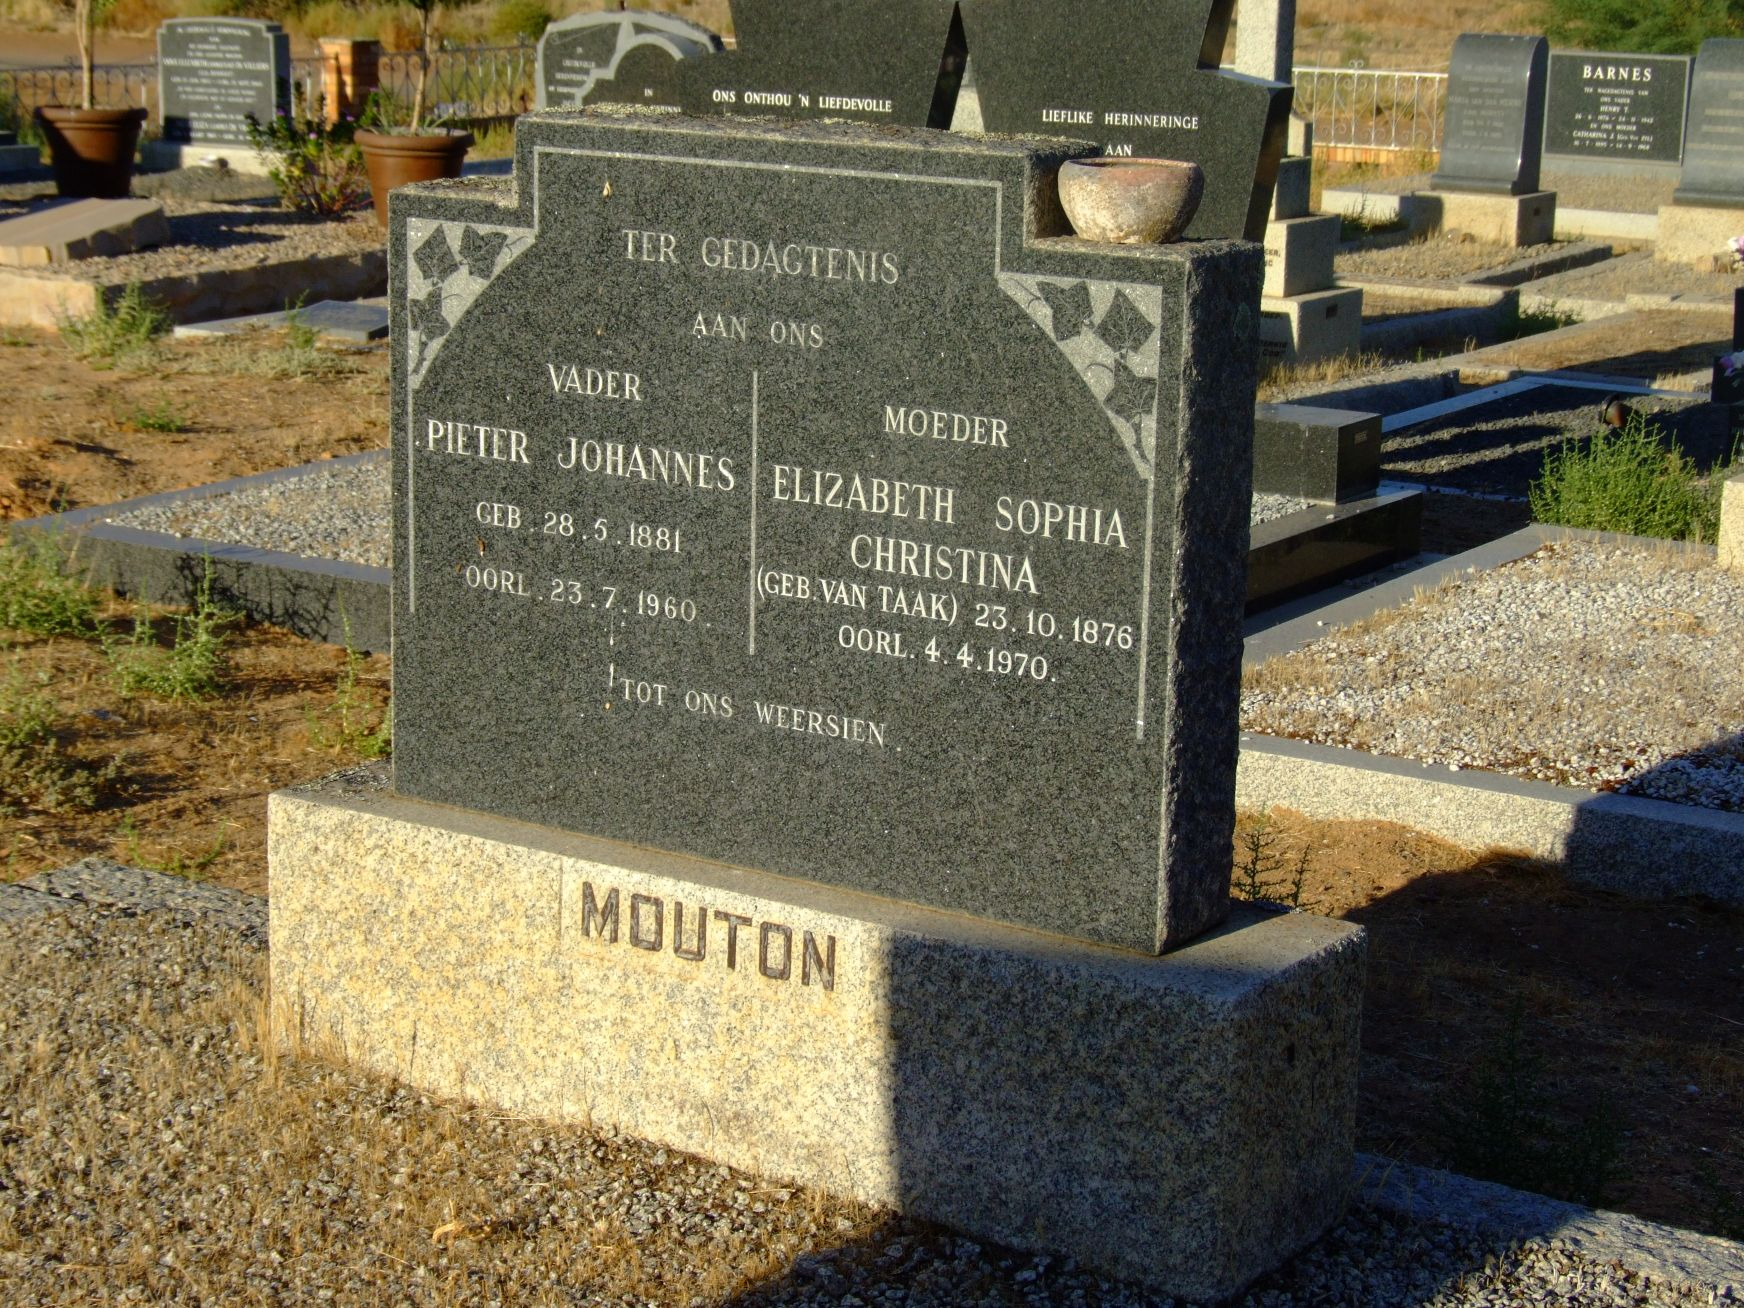 Mouton, Pieter Johannes and Mouton, Elizabeth Sophia Christina (